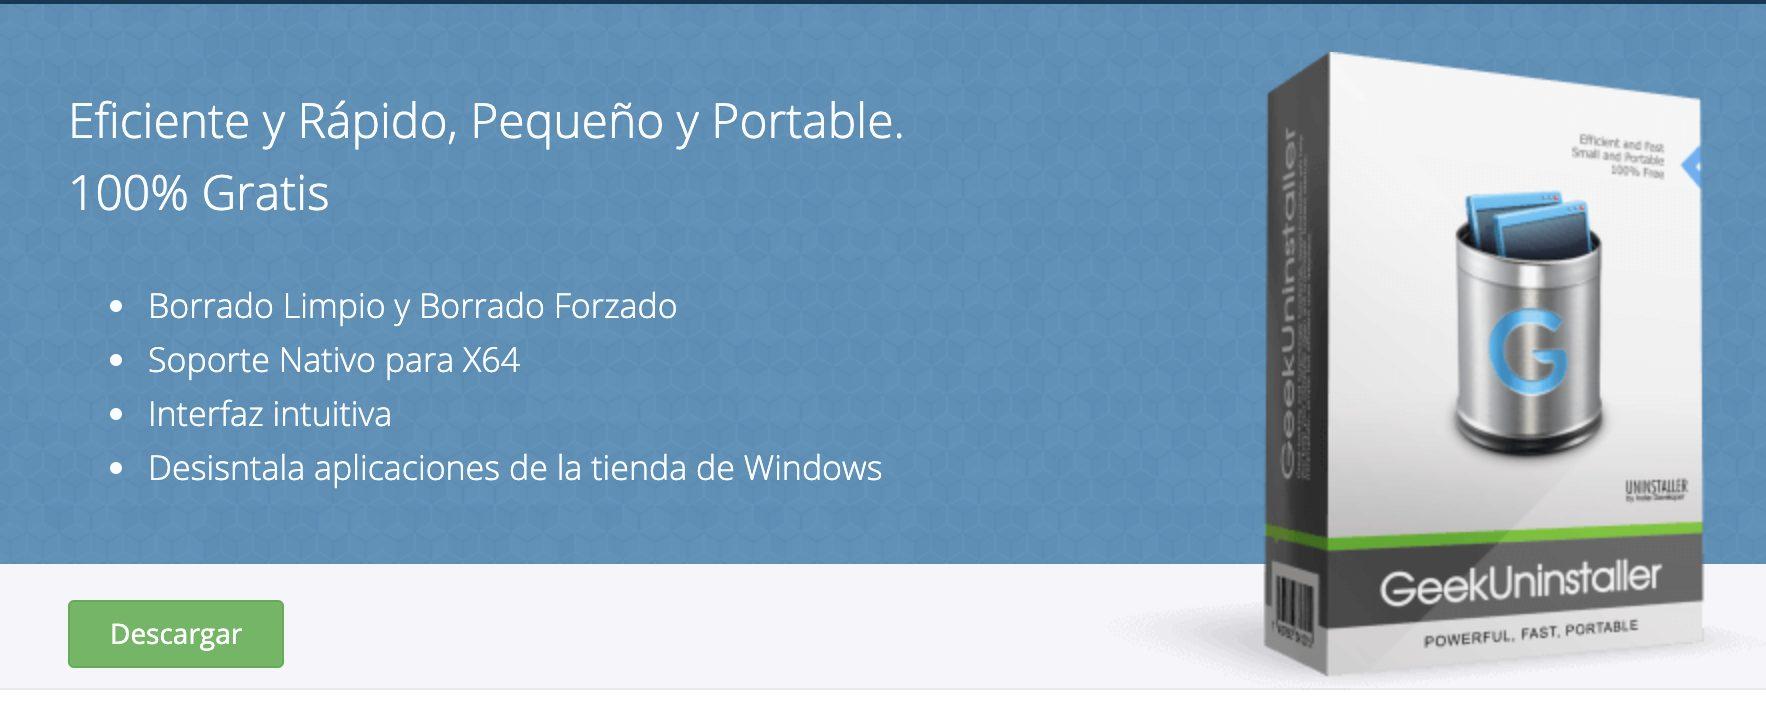 Geek Unistaller, Borrar rastros de un programa desinstalado en Windows